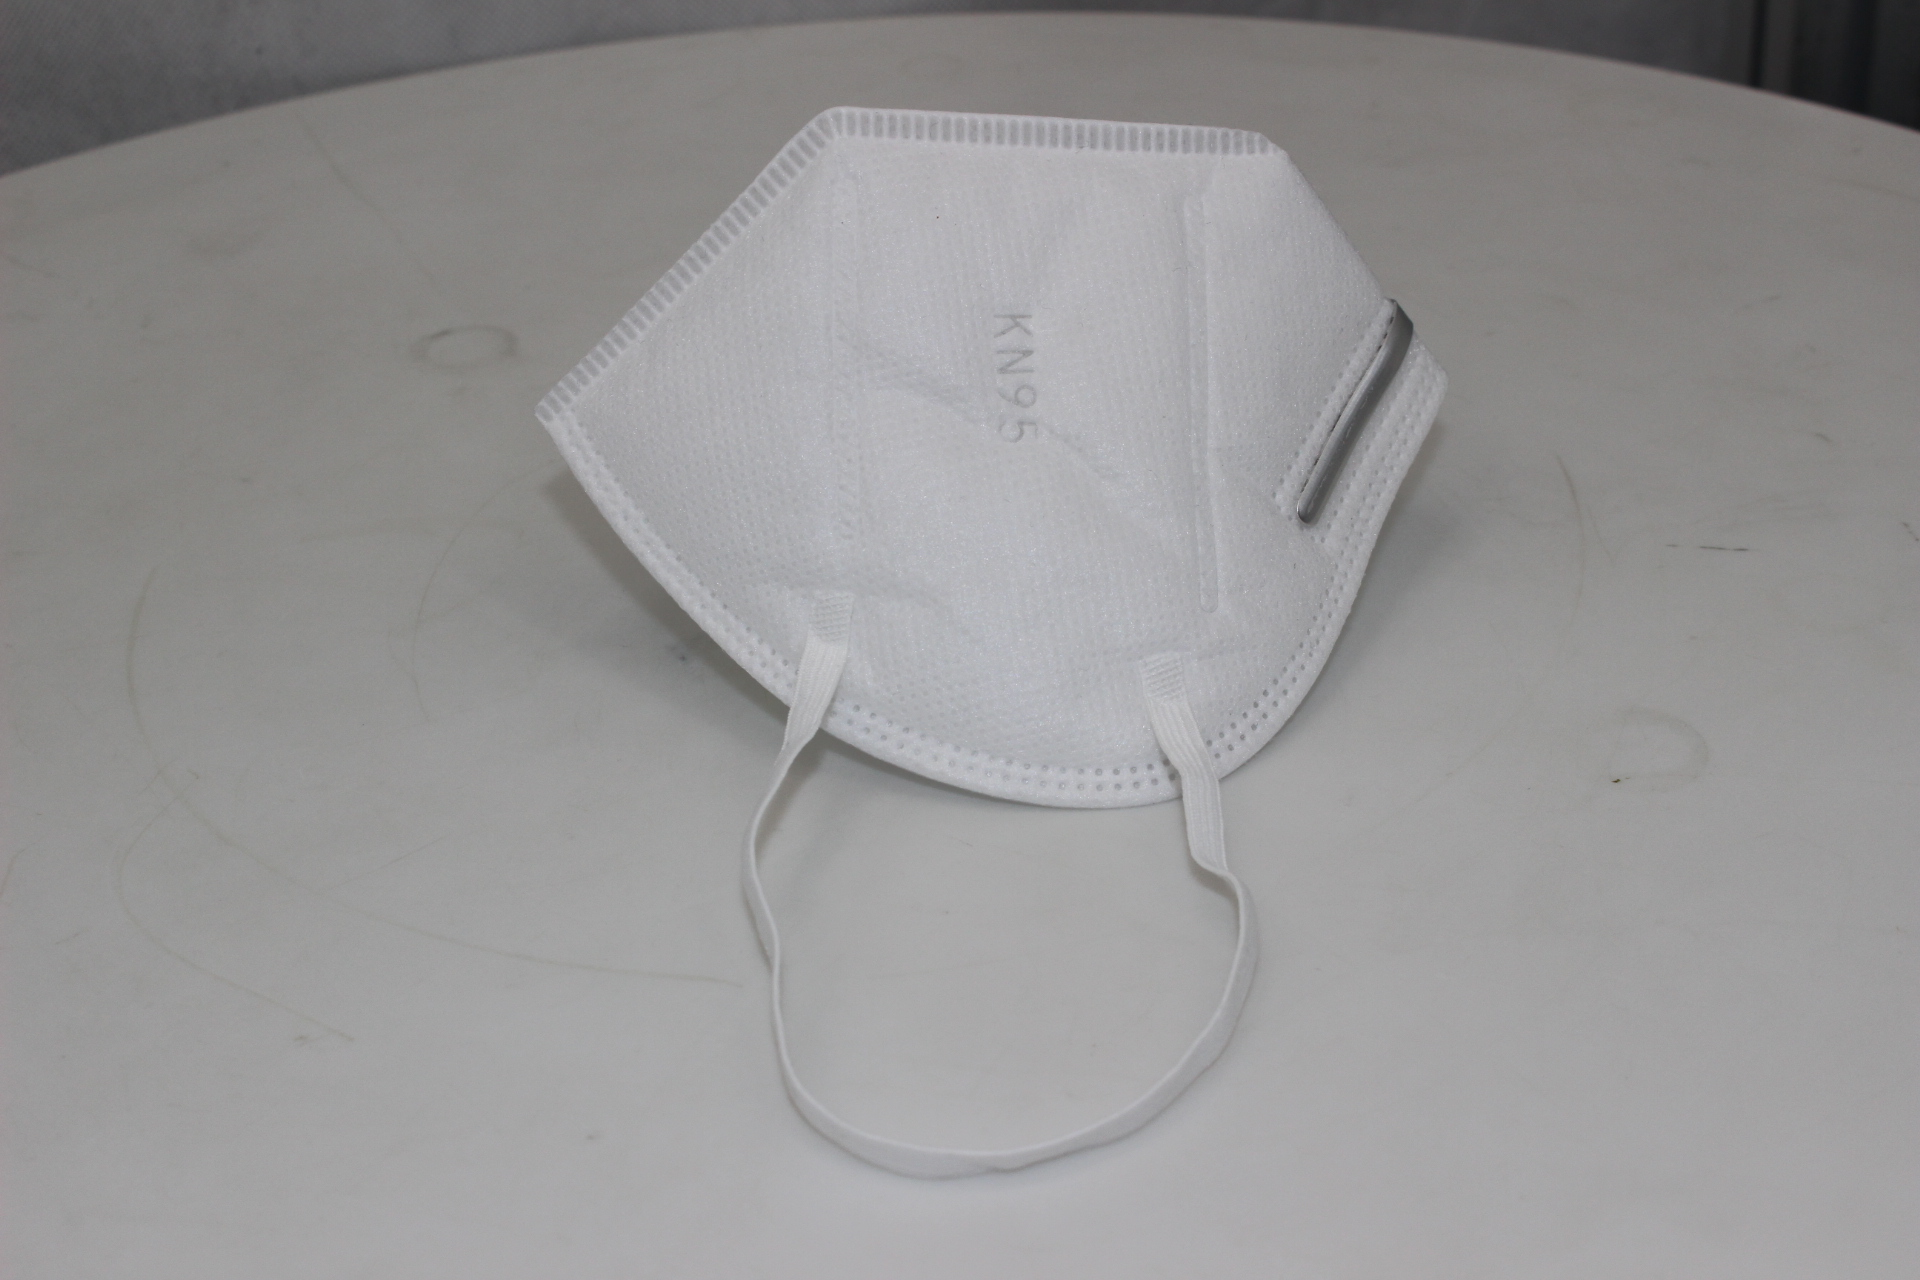 KN-95 Mask Filter Respirator Fold Folding Face KN95 Mask 3 layers Featured Image